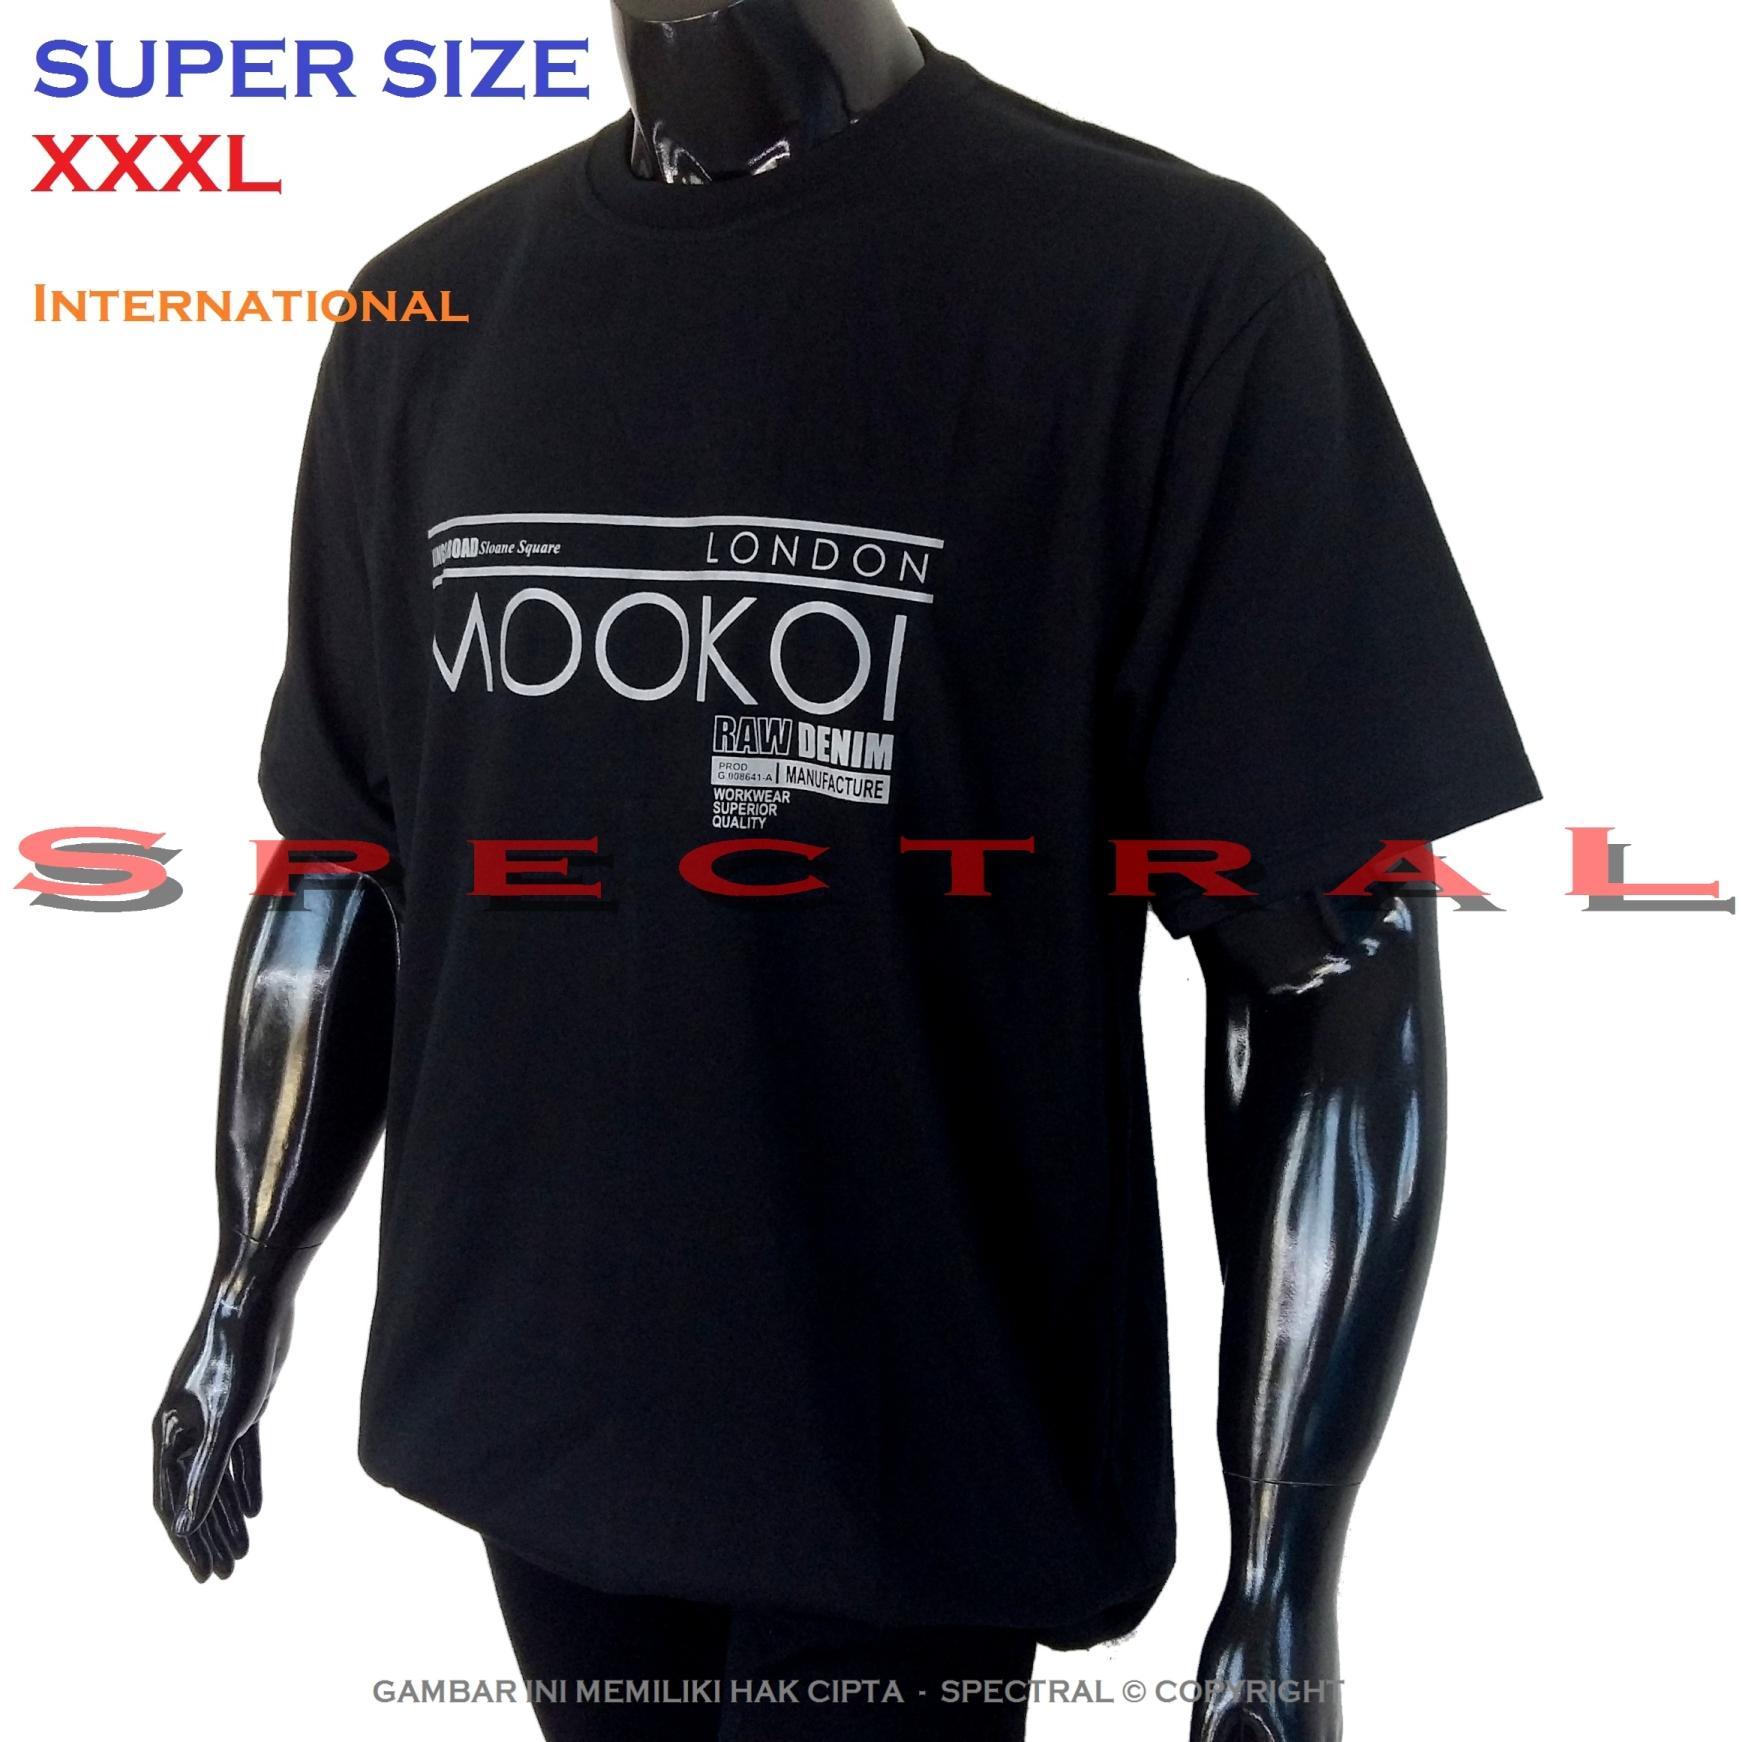 Spectral – SUPER BIG SIZE XXXL INTERNATIONAL 100{55e037da9a70d2f692182bf73e9ad7c46940d20c7297ef2687c837f7bdb7b002} Soft Cotton Combed Kaos Distro Jumbo BIGSIZE T-Shirt Fashion Ukuran Besar Polos Celana Atasan Pria Wanita Katun Bapak Orang Tua Gemuk Gendut Lengan Simple Sport Casual 3L 3XL Baju Cowo Cewe Pakaian Terbaru